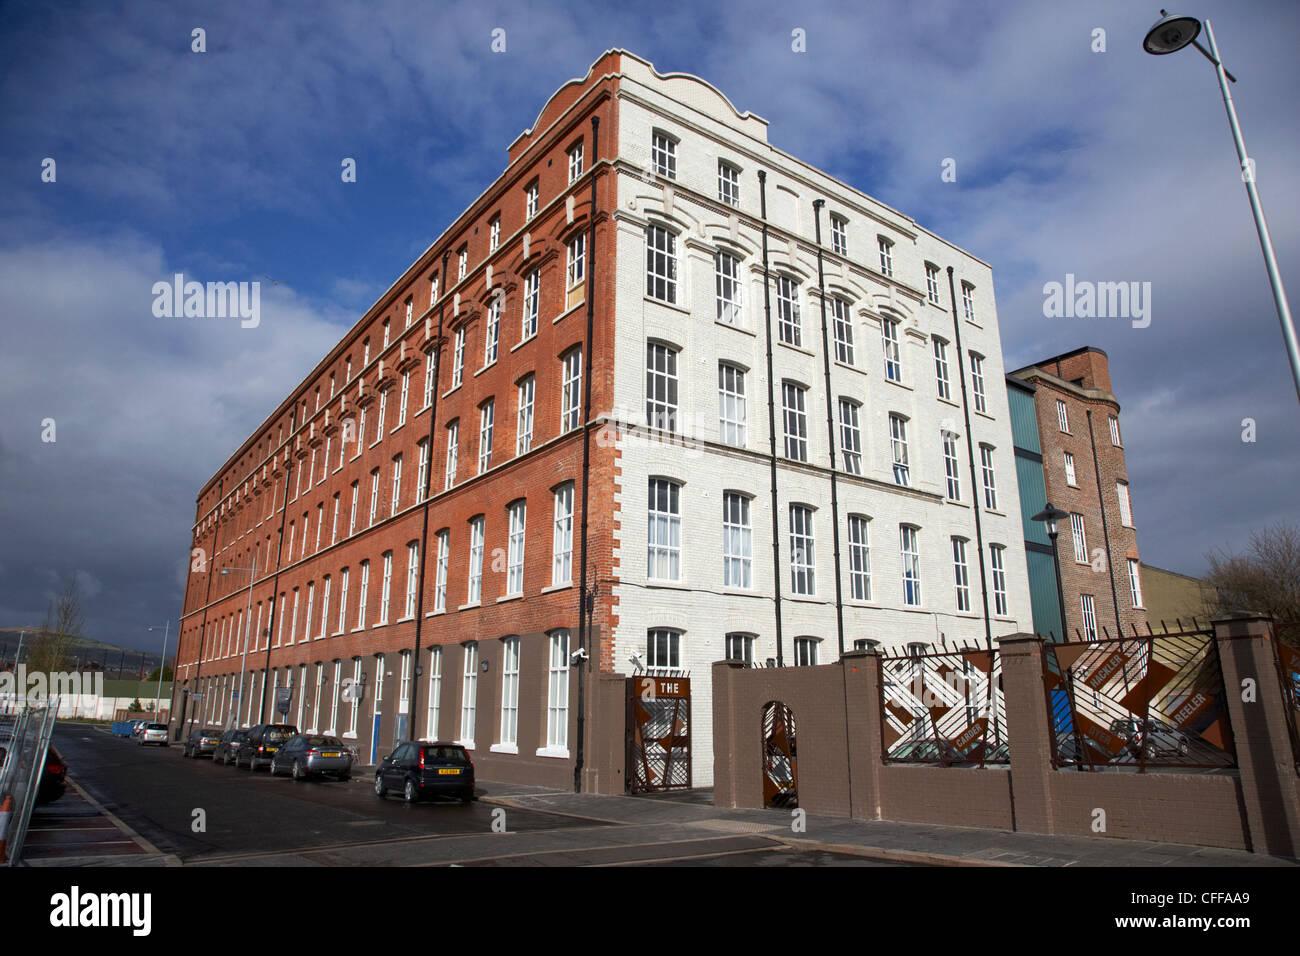 Northern Ireland Flax Stock Photos & Northern Ireland Flax Stock